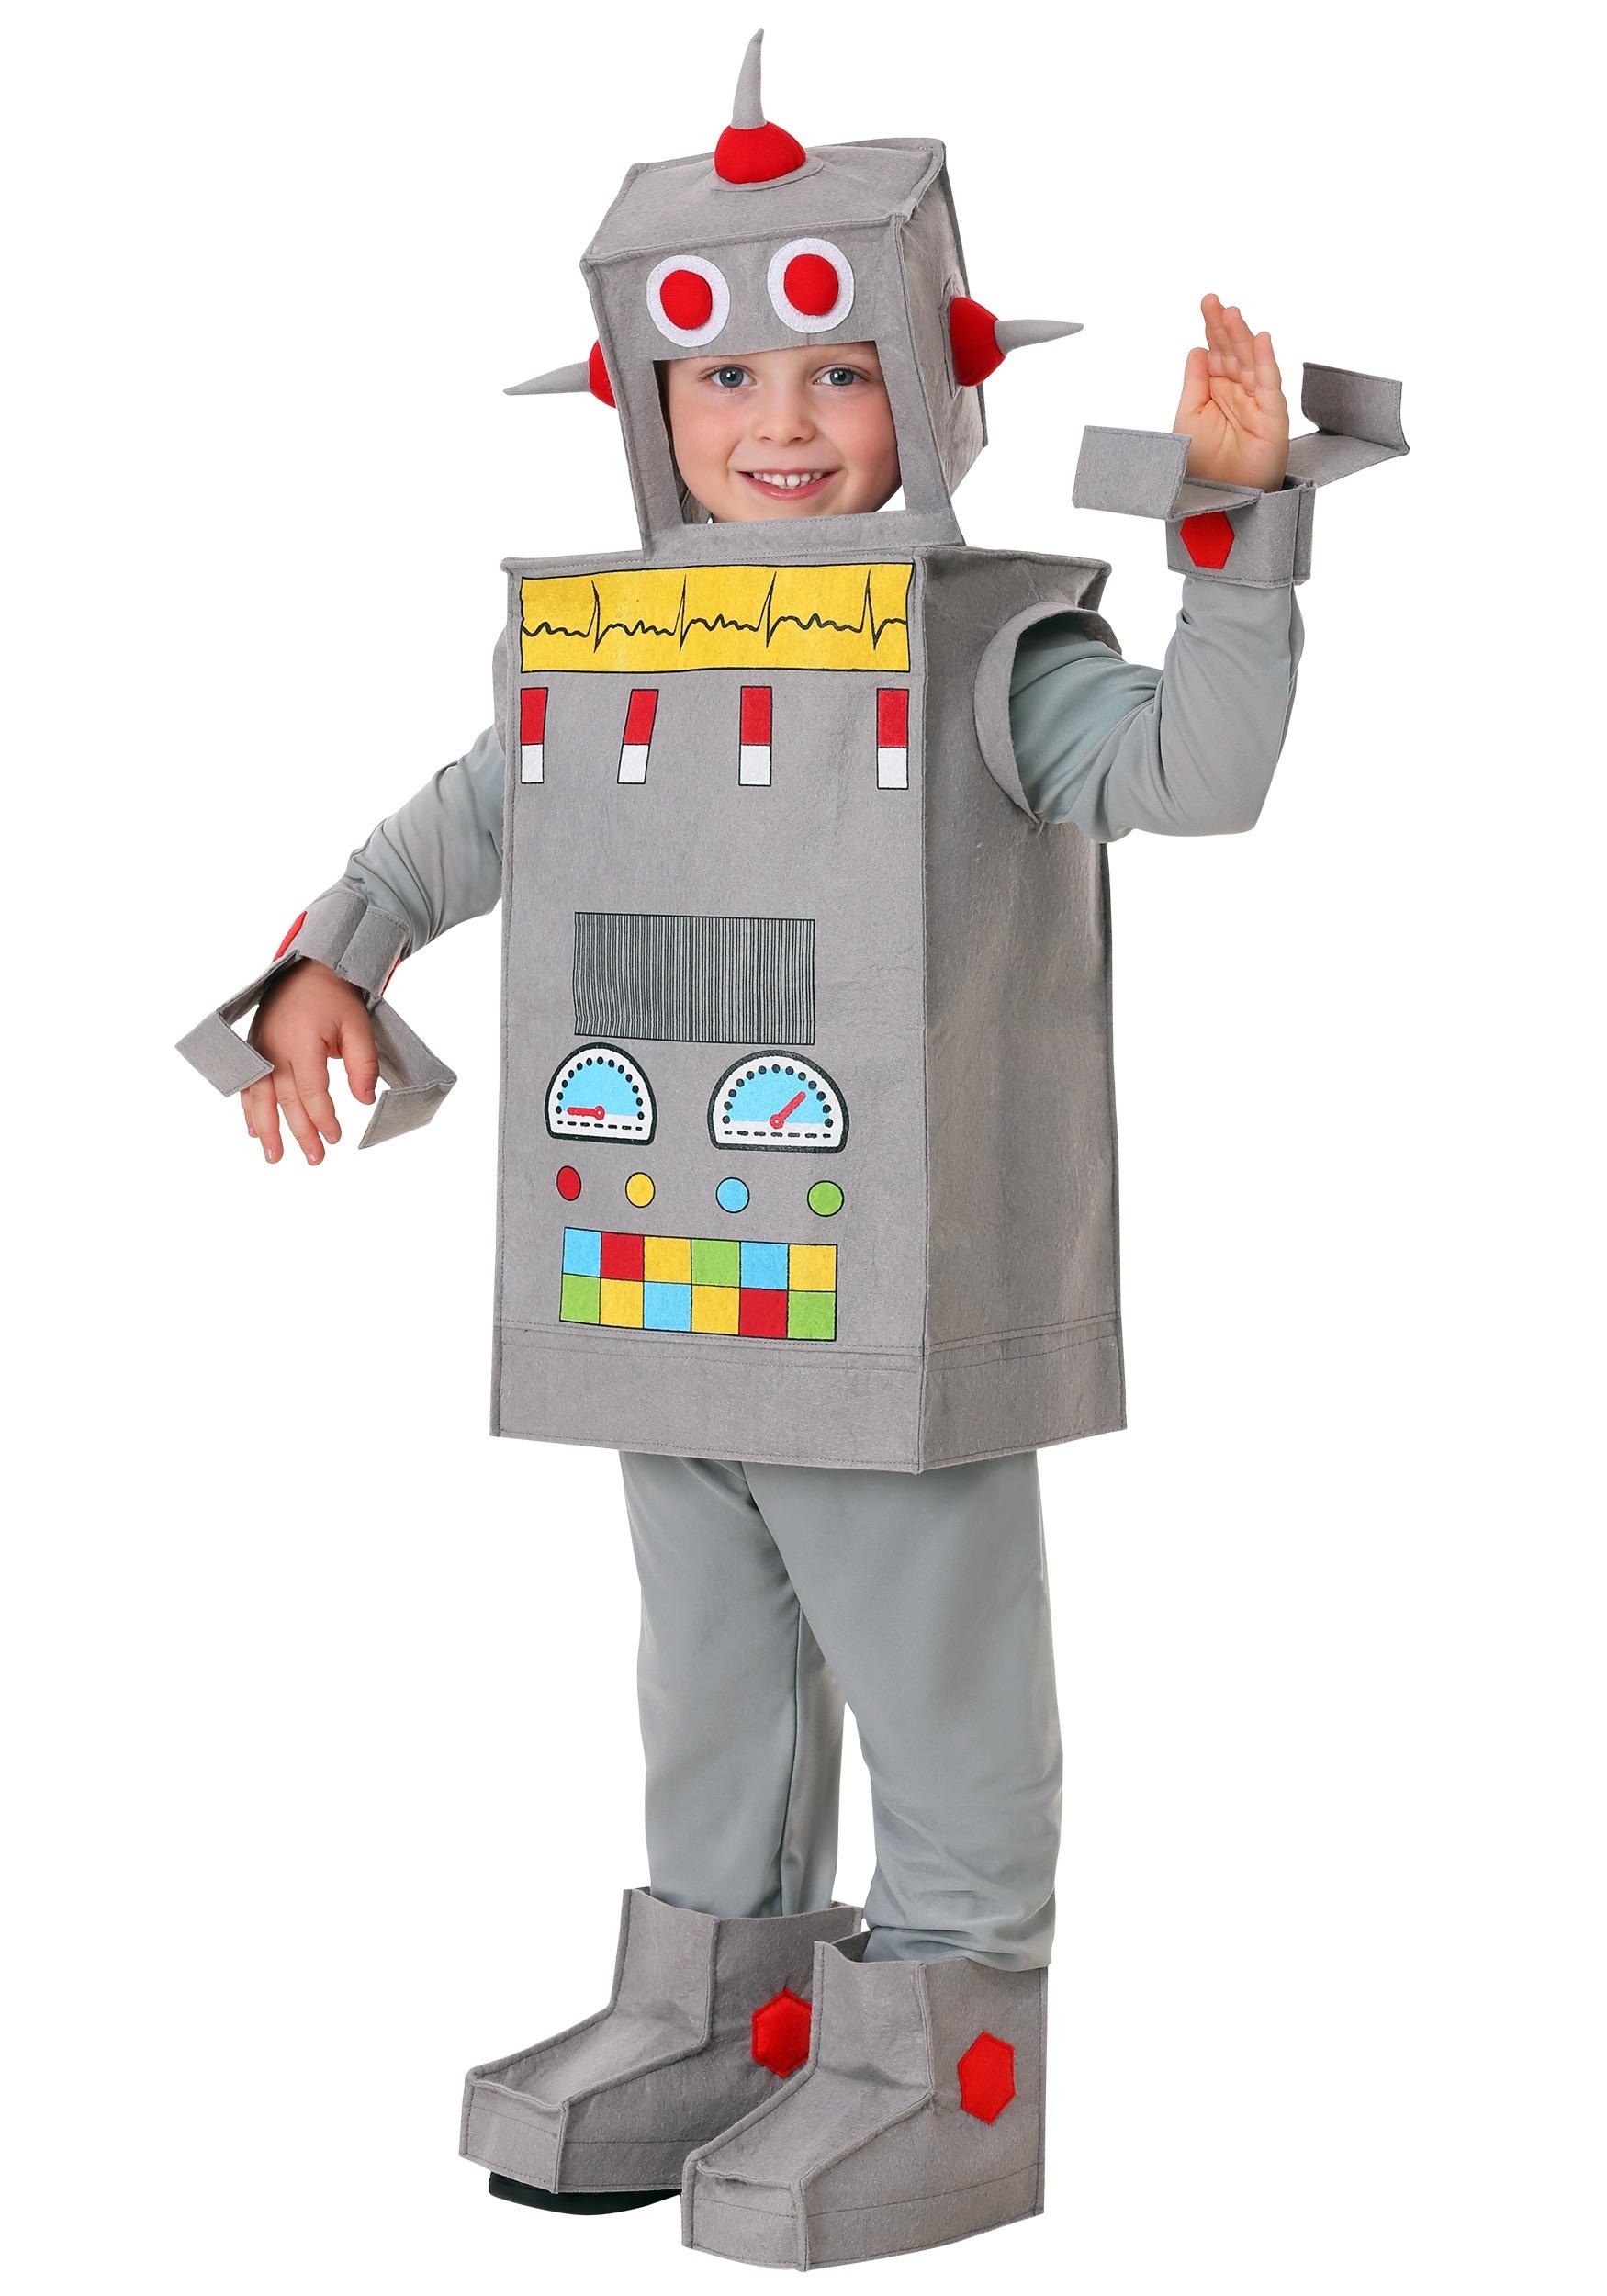 Costume Halloween Robot.Robot Rascal Toddler Costume